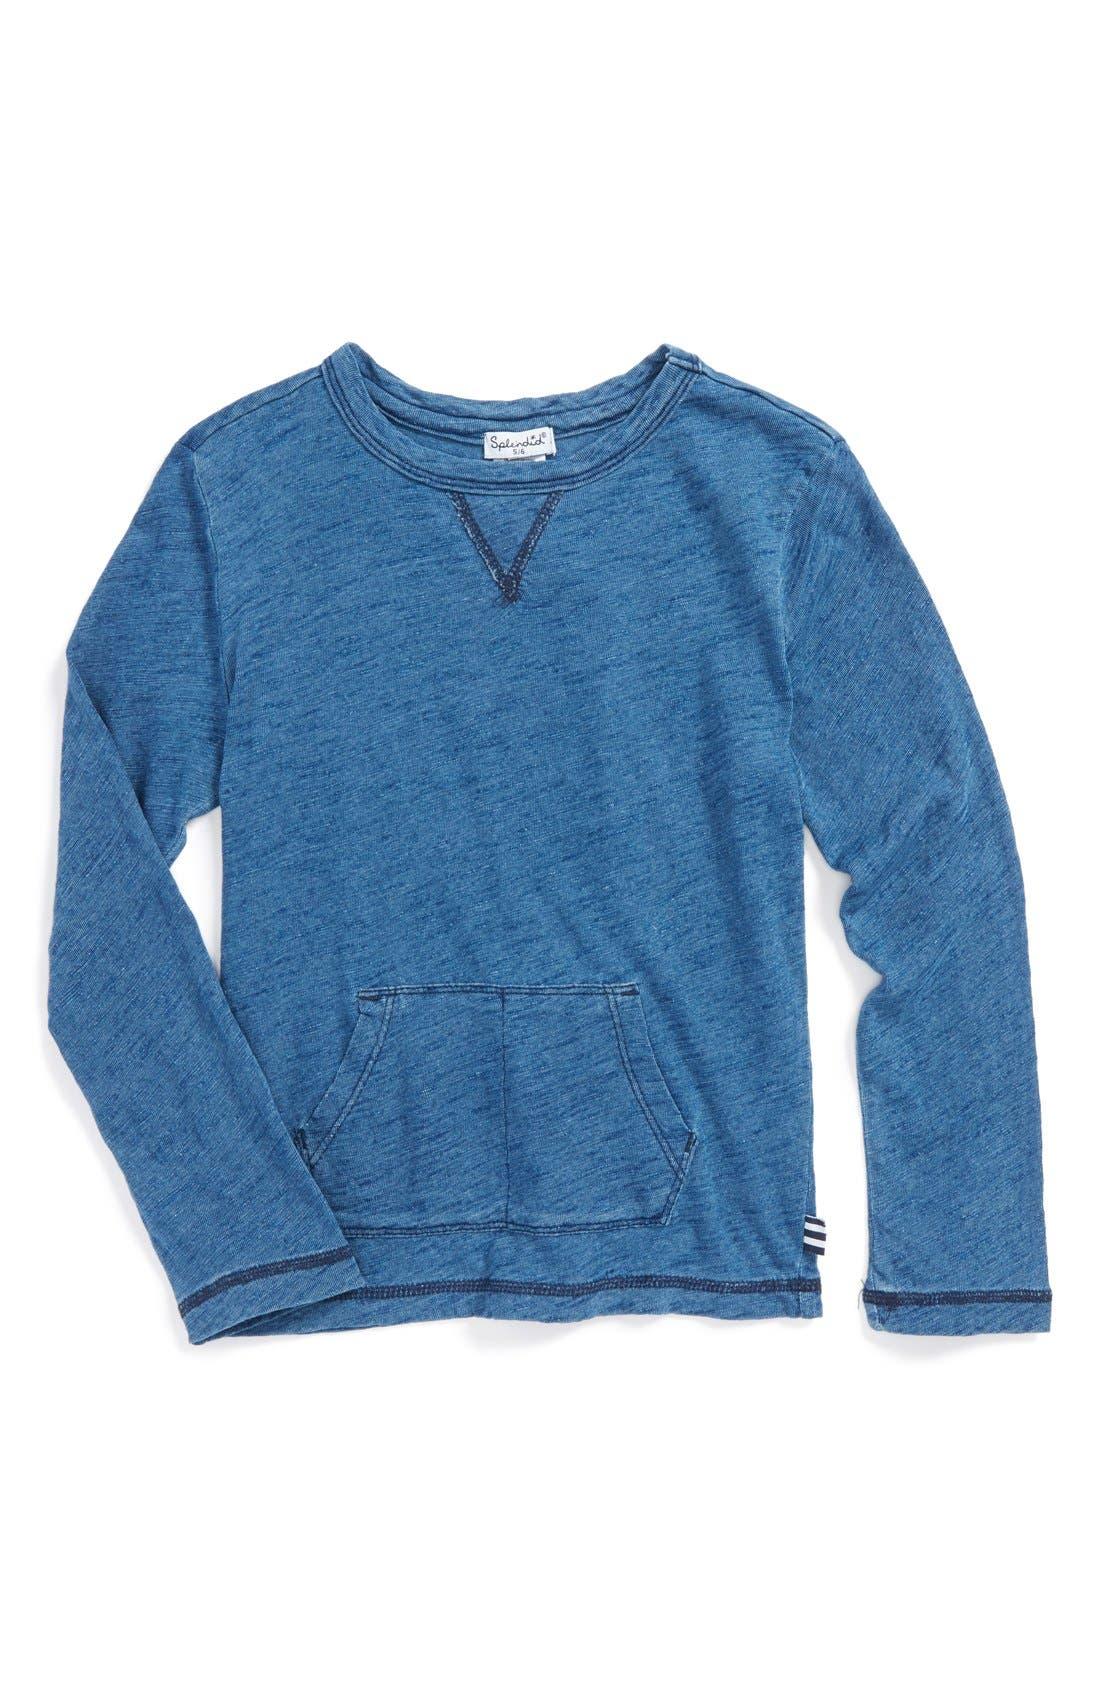 Splendid Indigo Slub Cotton Jersey Pullover (Toddler Boys & Little Boys)